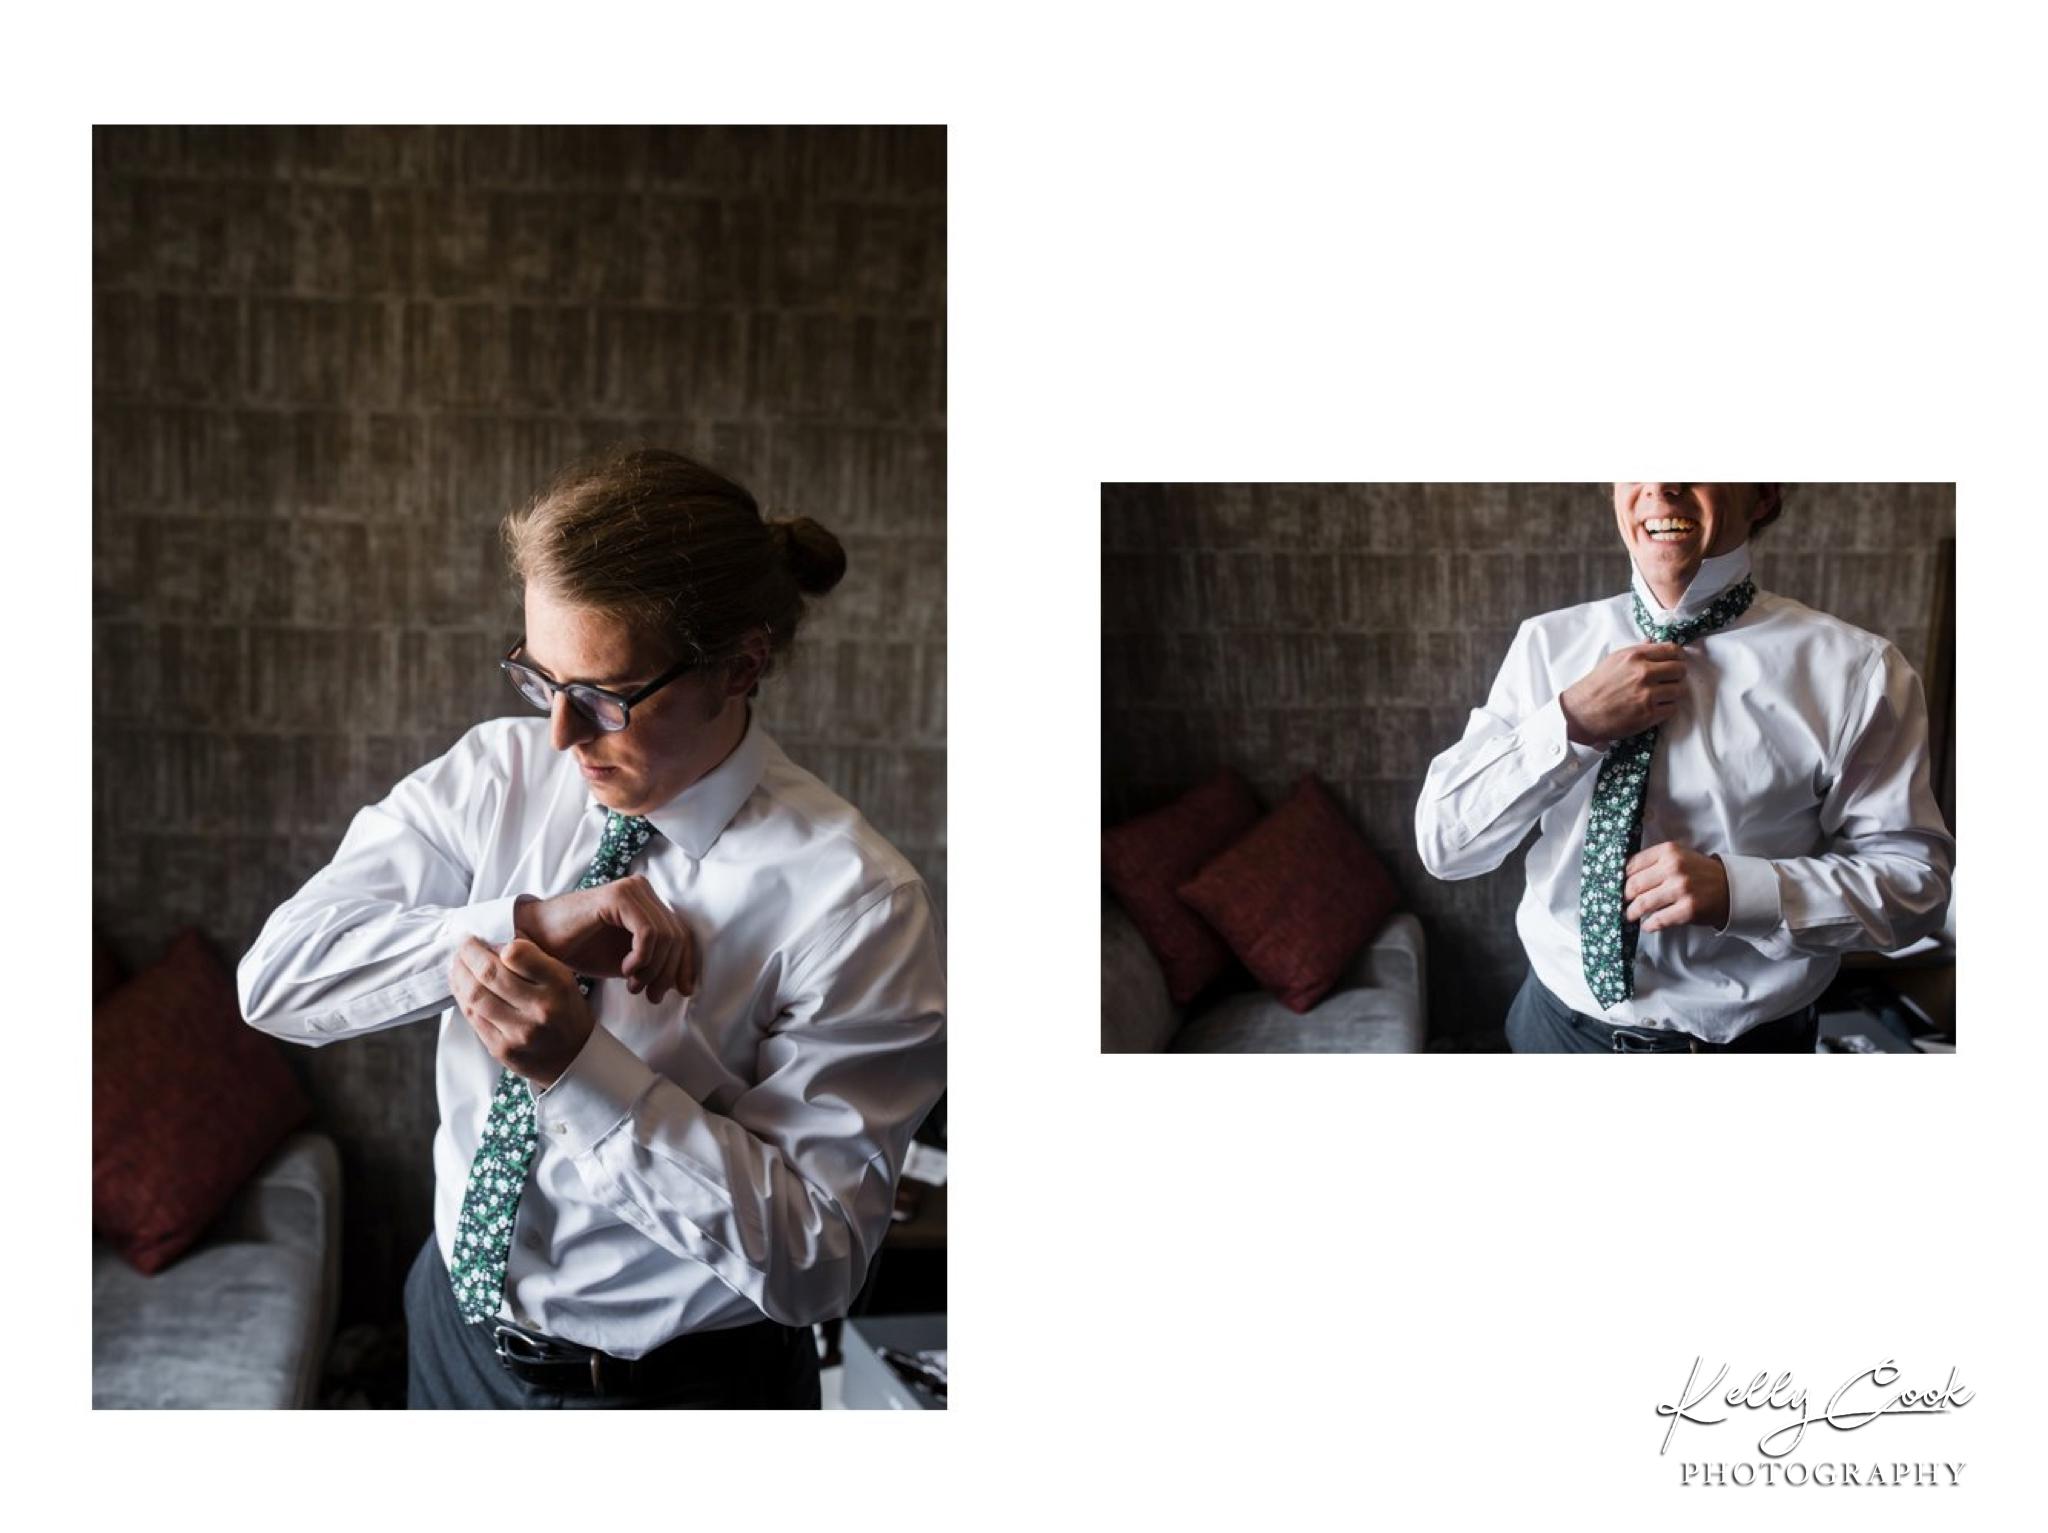 Groom getting ready on his wedding day